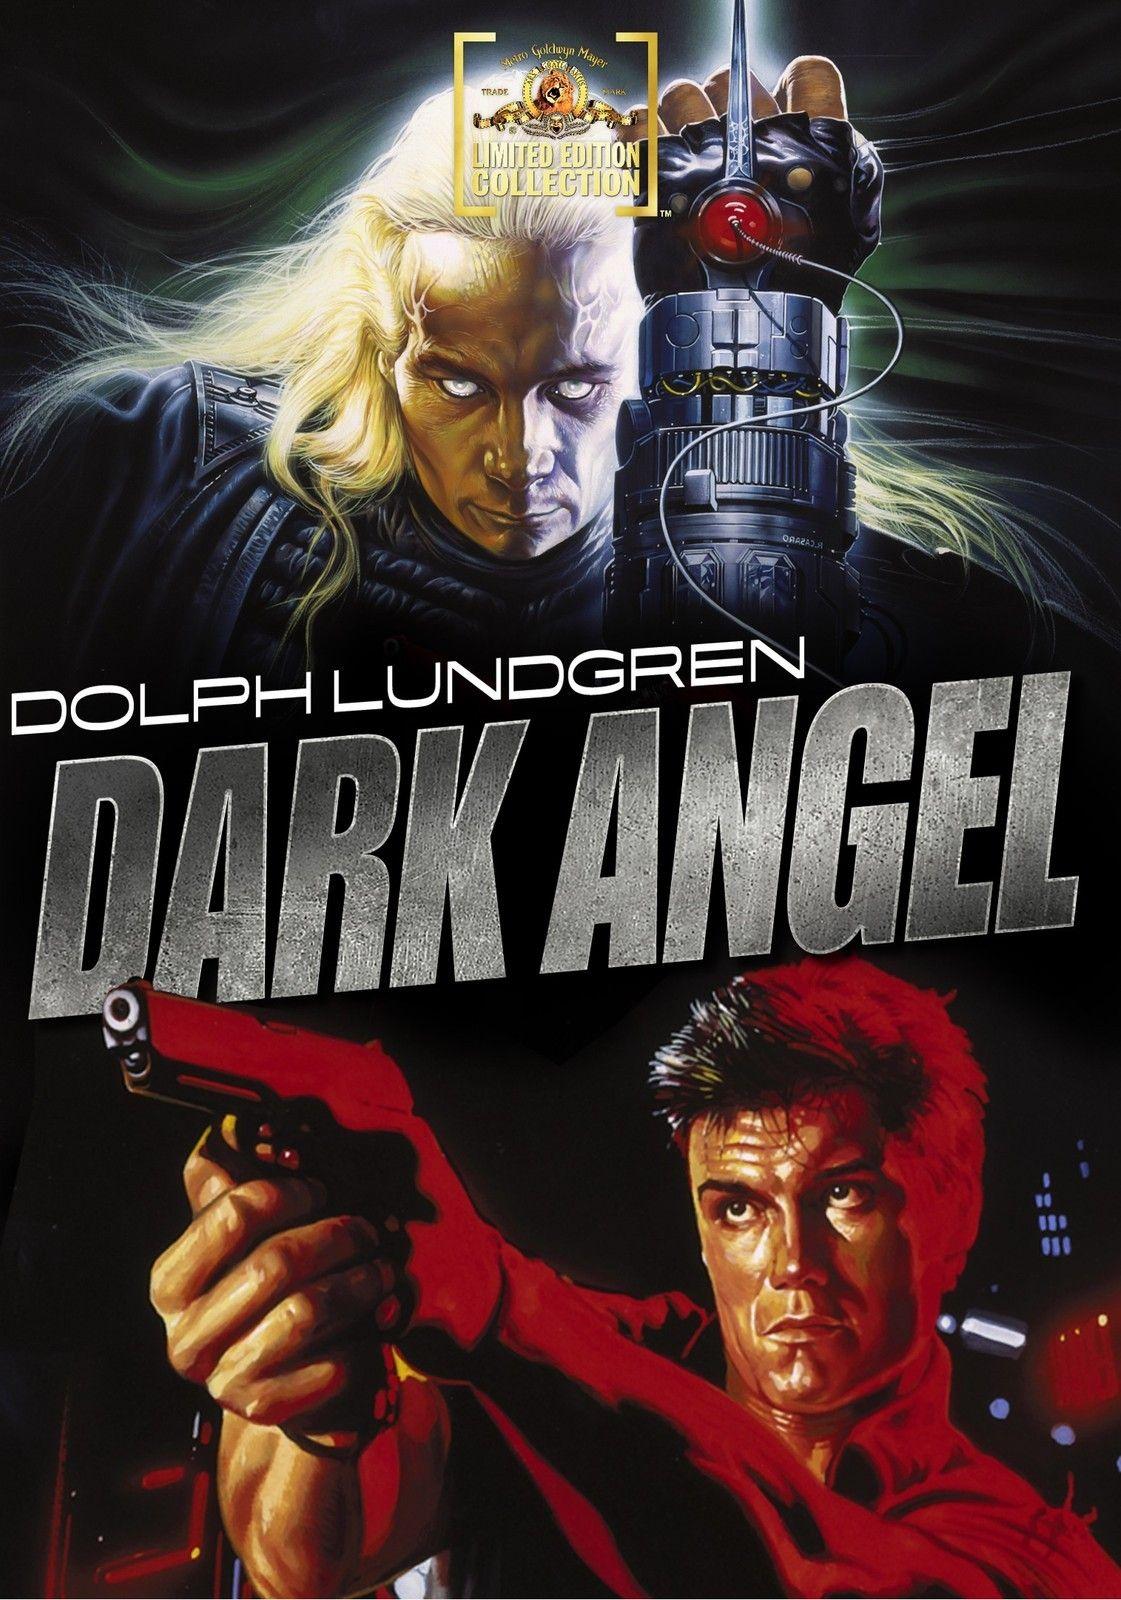 Dark Angel Aka I Come In Peace 1990 Craig R Baxley Carteles De Cine Póster De Cine Cartel Cinematográfico